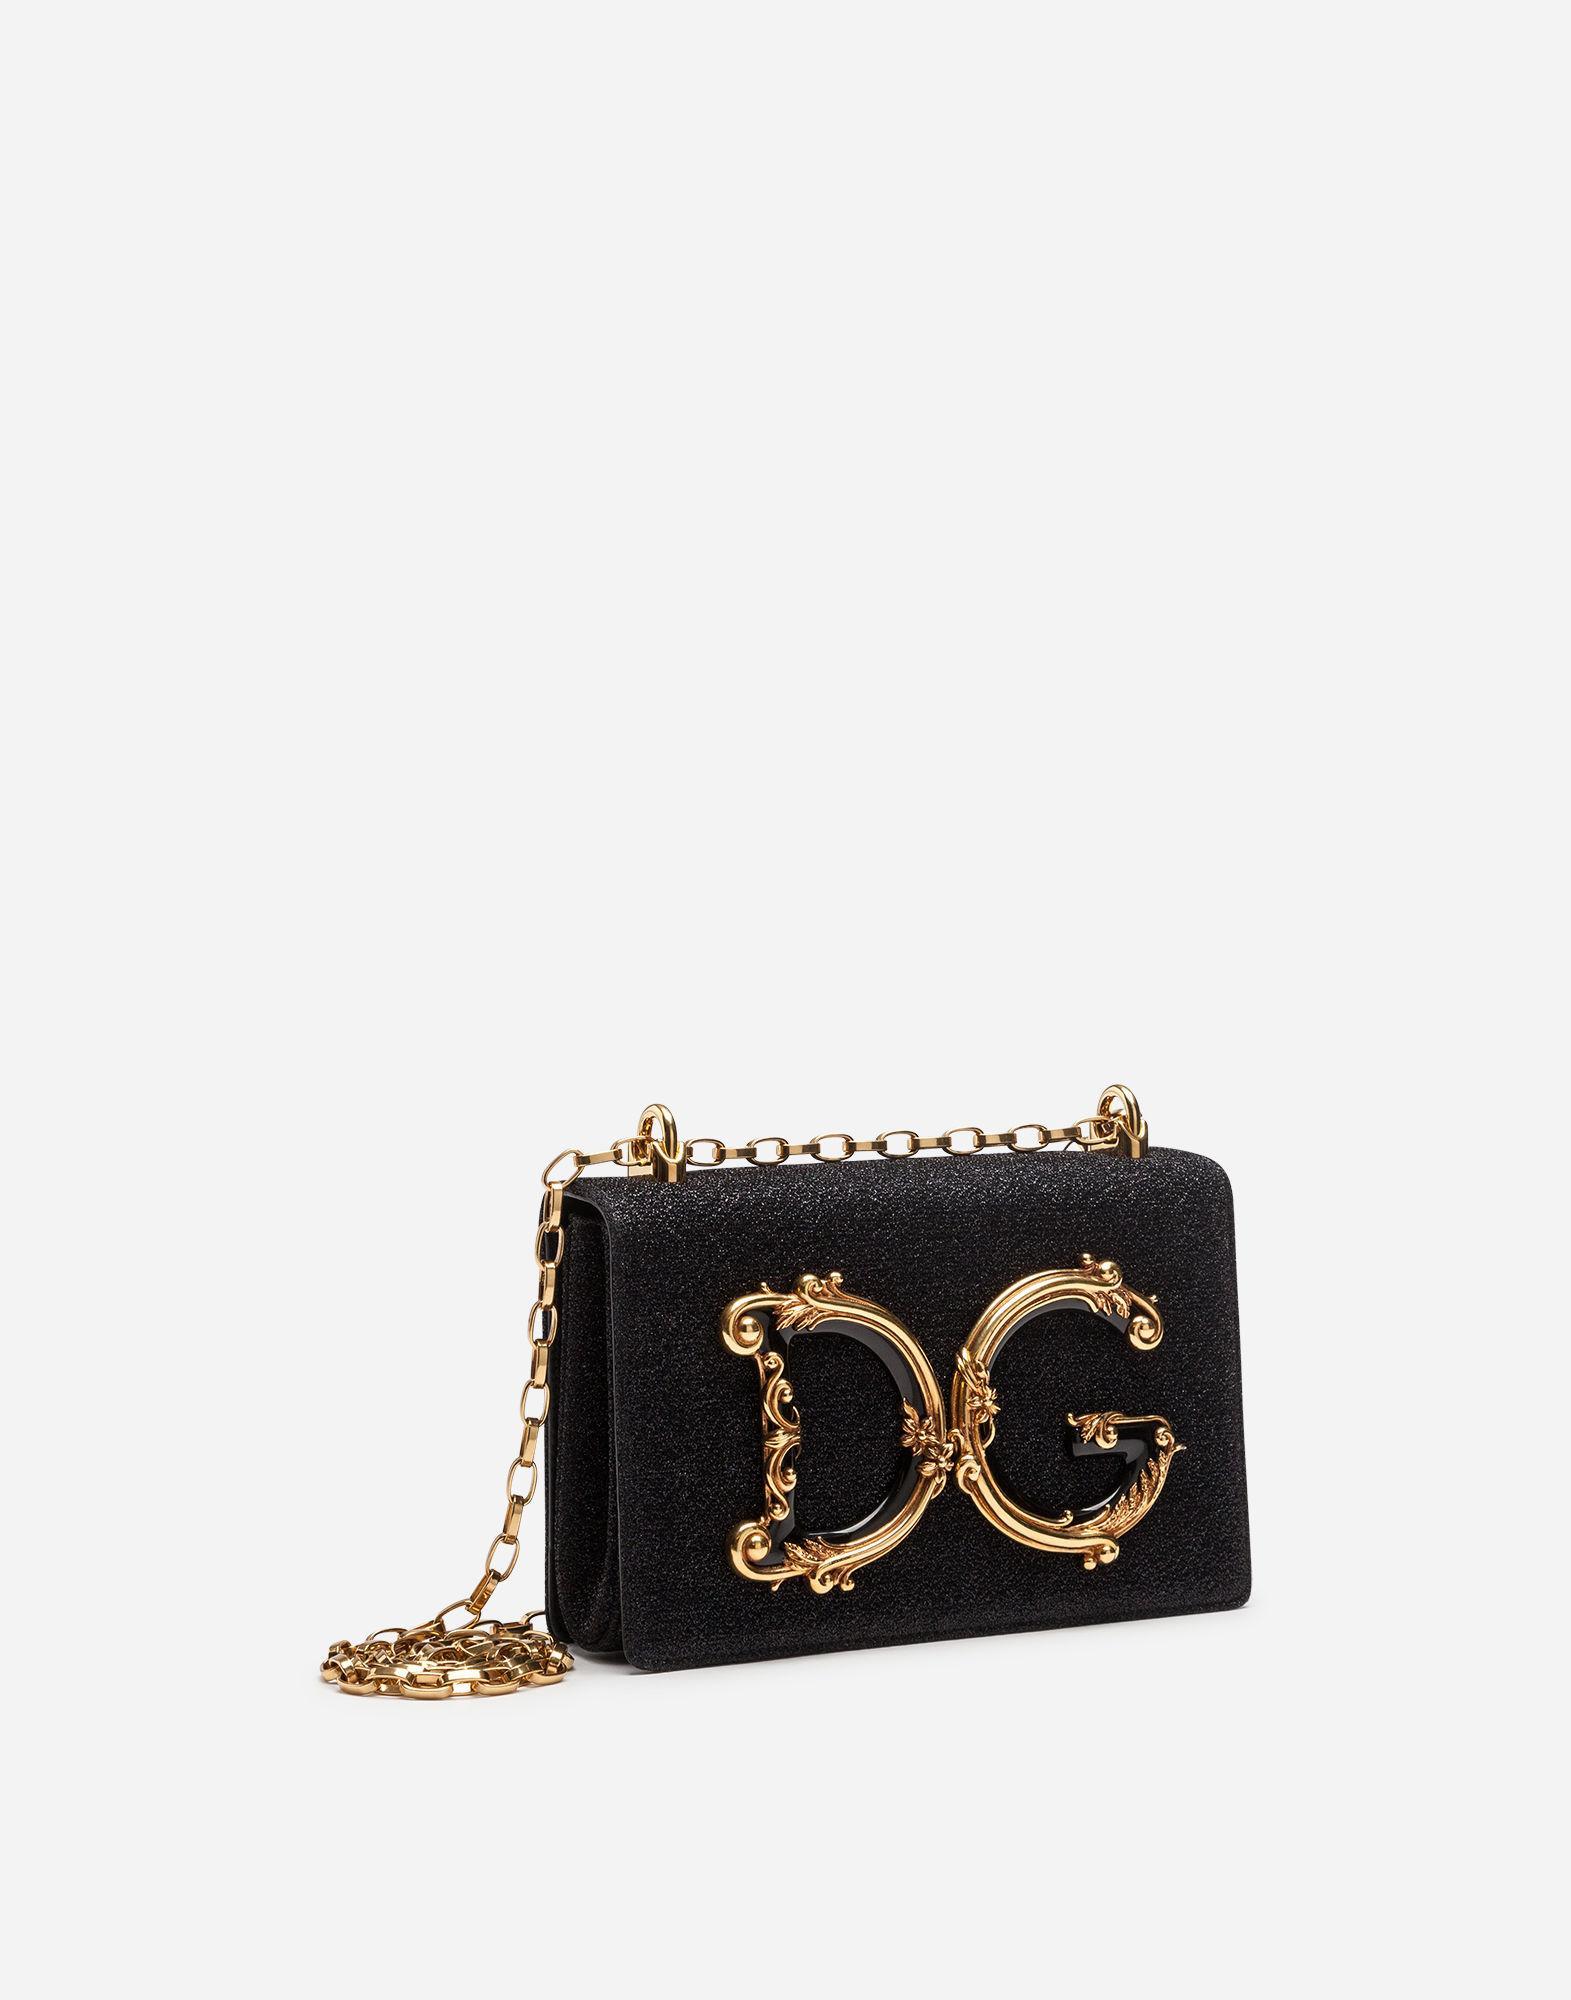 1f9878e88664 Lyst - Dolce   Gabbana Dg Girls Shoulder Bag In Nappa Leather in Black -  Save 5%